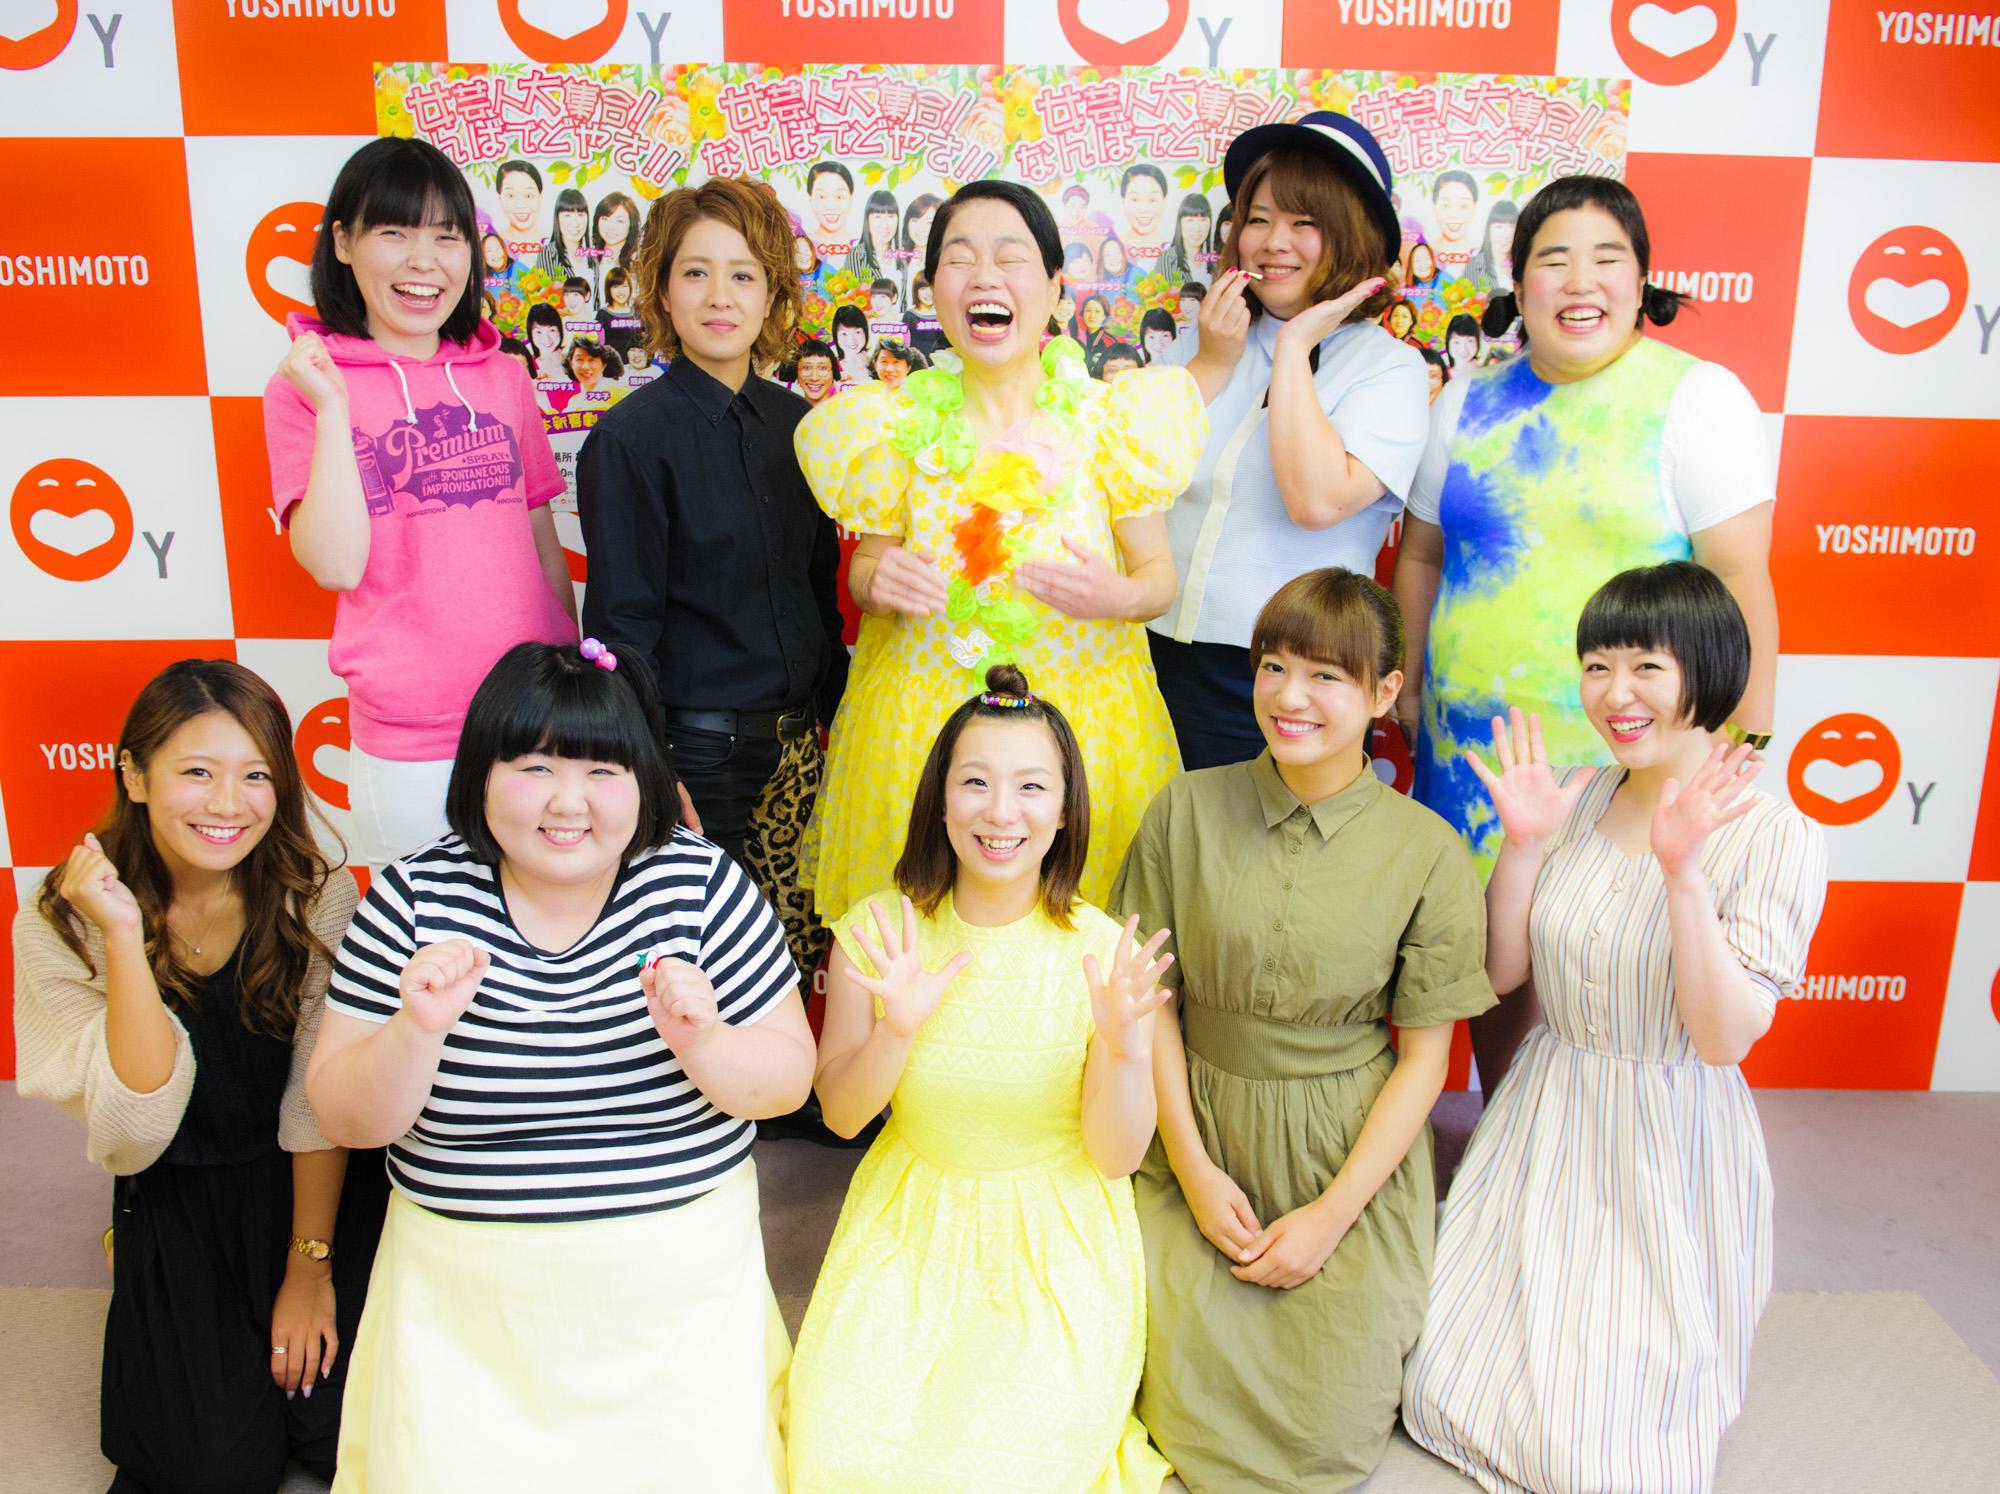 http://news.yoshimoto.co.jp/20160803125002-78958345be6162e2be399bd25fcce9d7d374c260.jpg